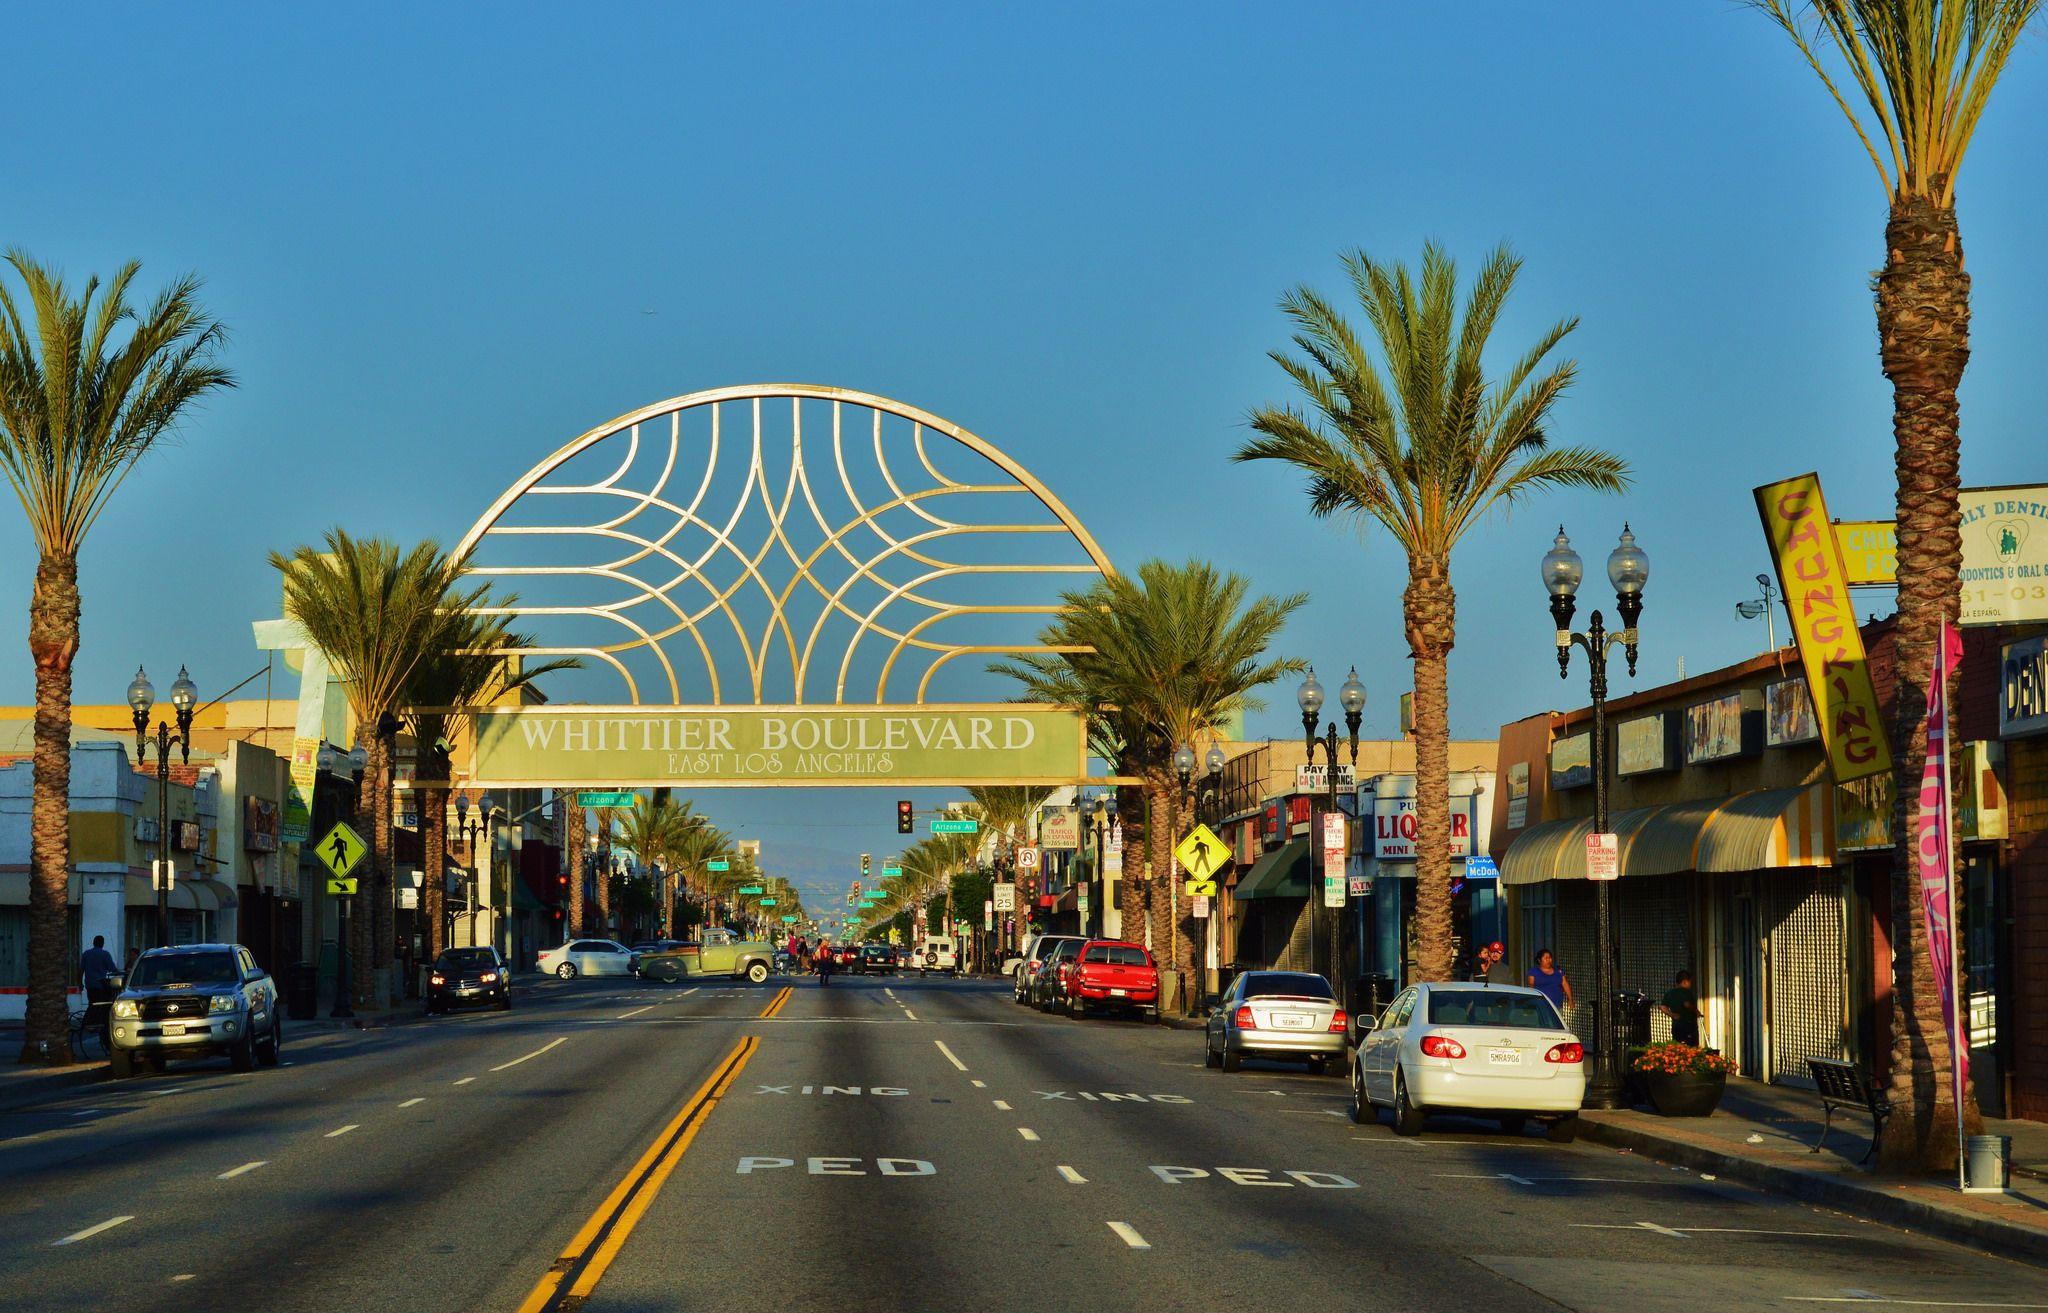 Whittier Boulevard East Los Angeles East Los Angeles Los Angeles Photography Los Angeles